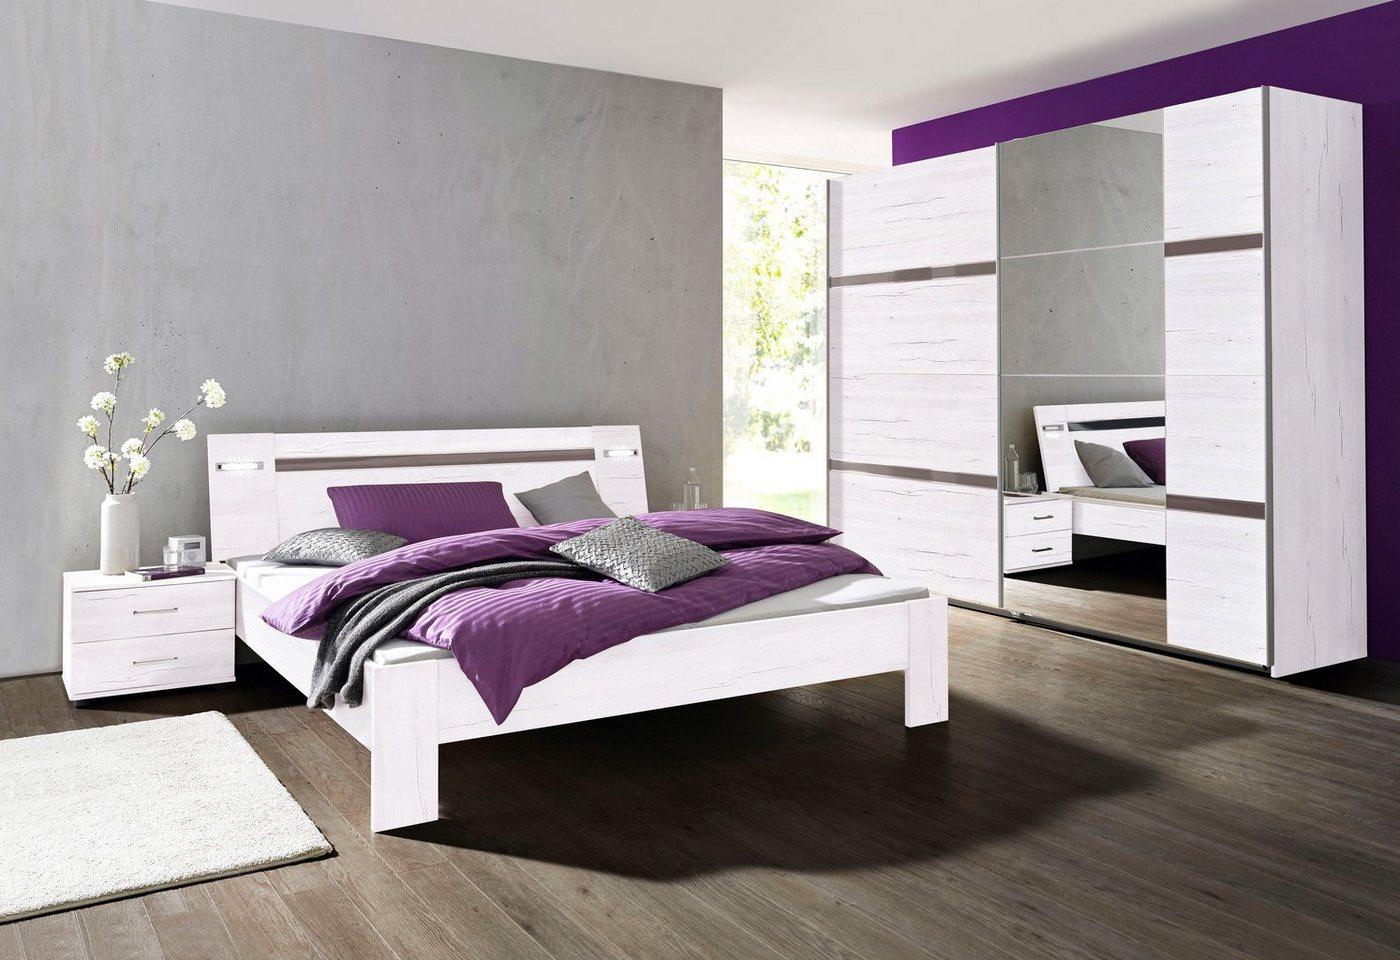 Slaapkamer-voordeelset met zweefdeurkast 4-delig